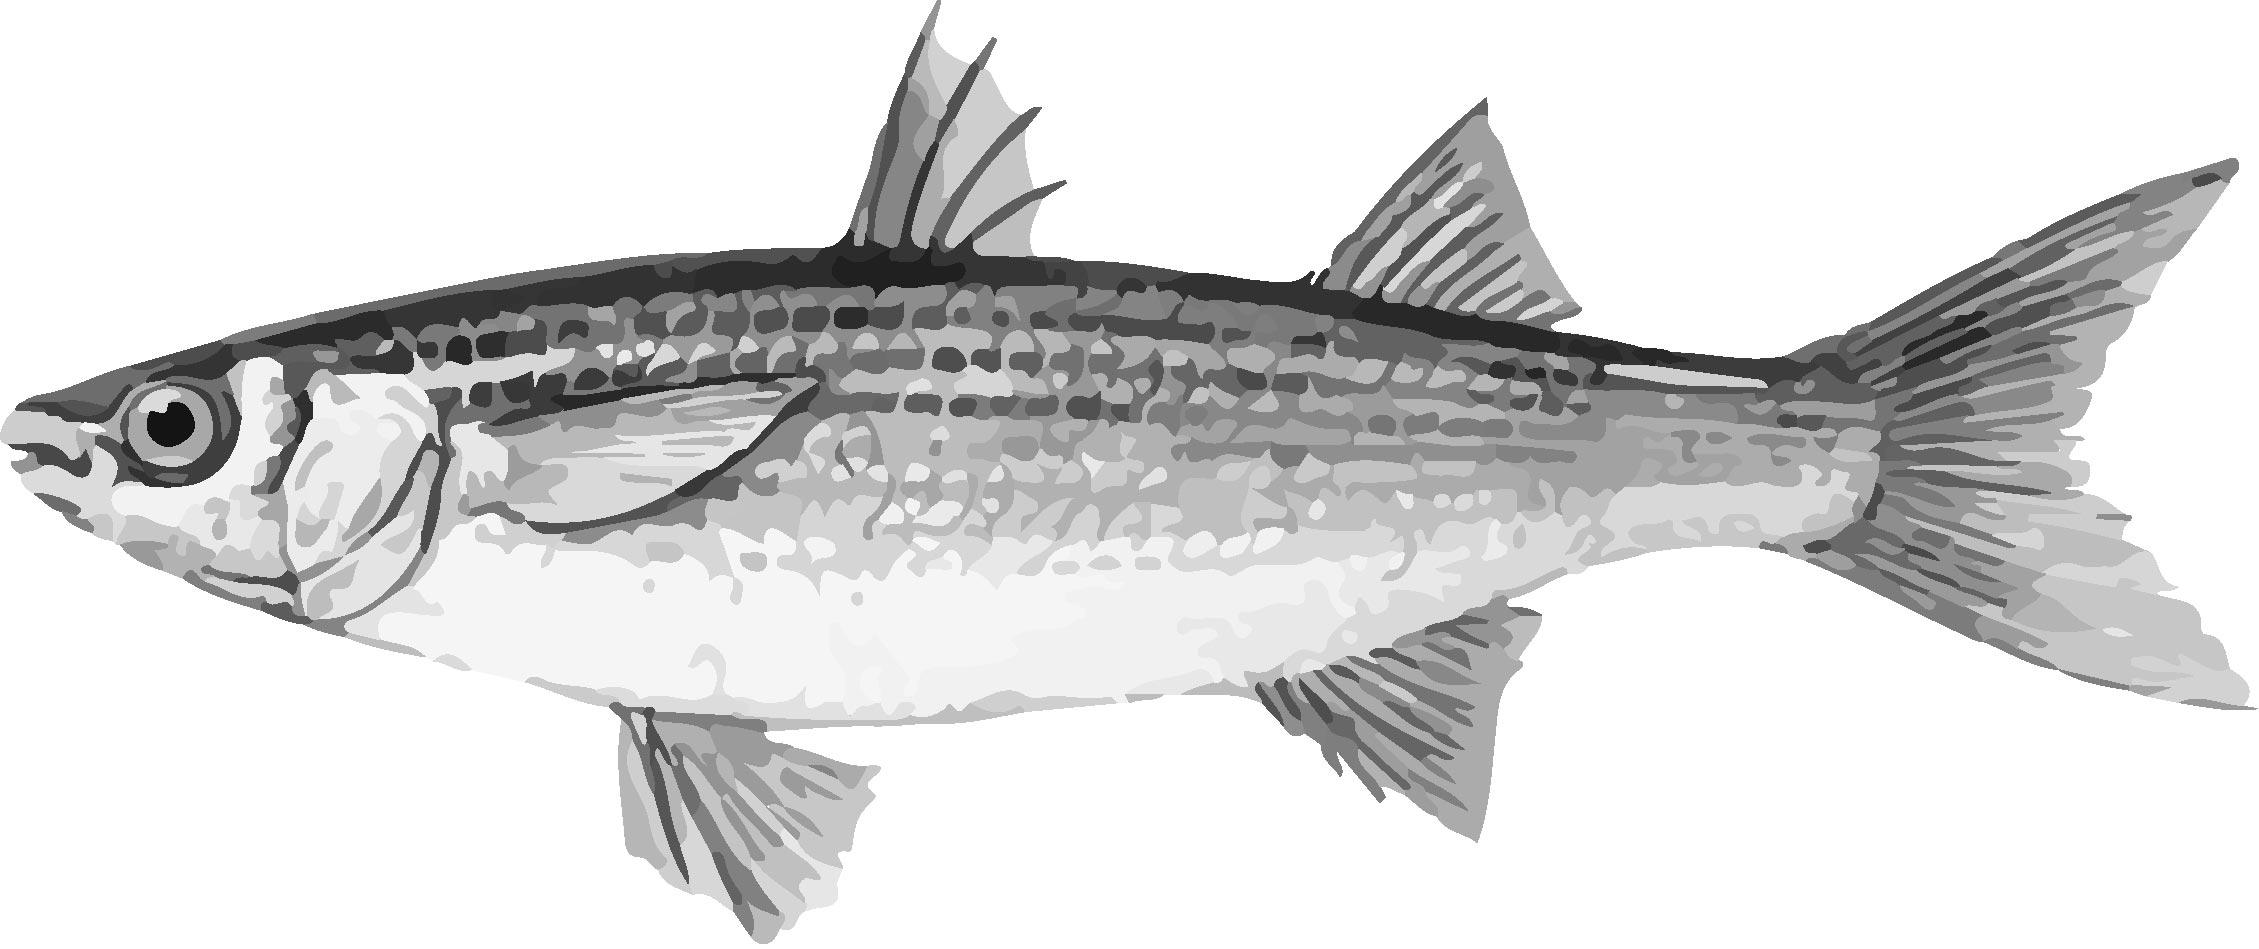 mullet-bottarga-fish-pic-blacck-and-white.jpg